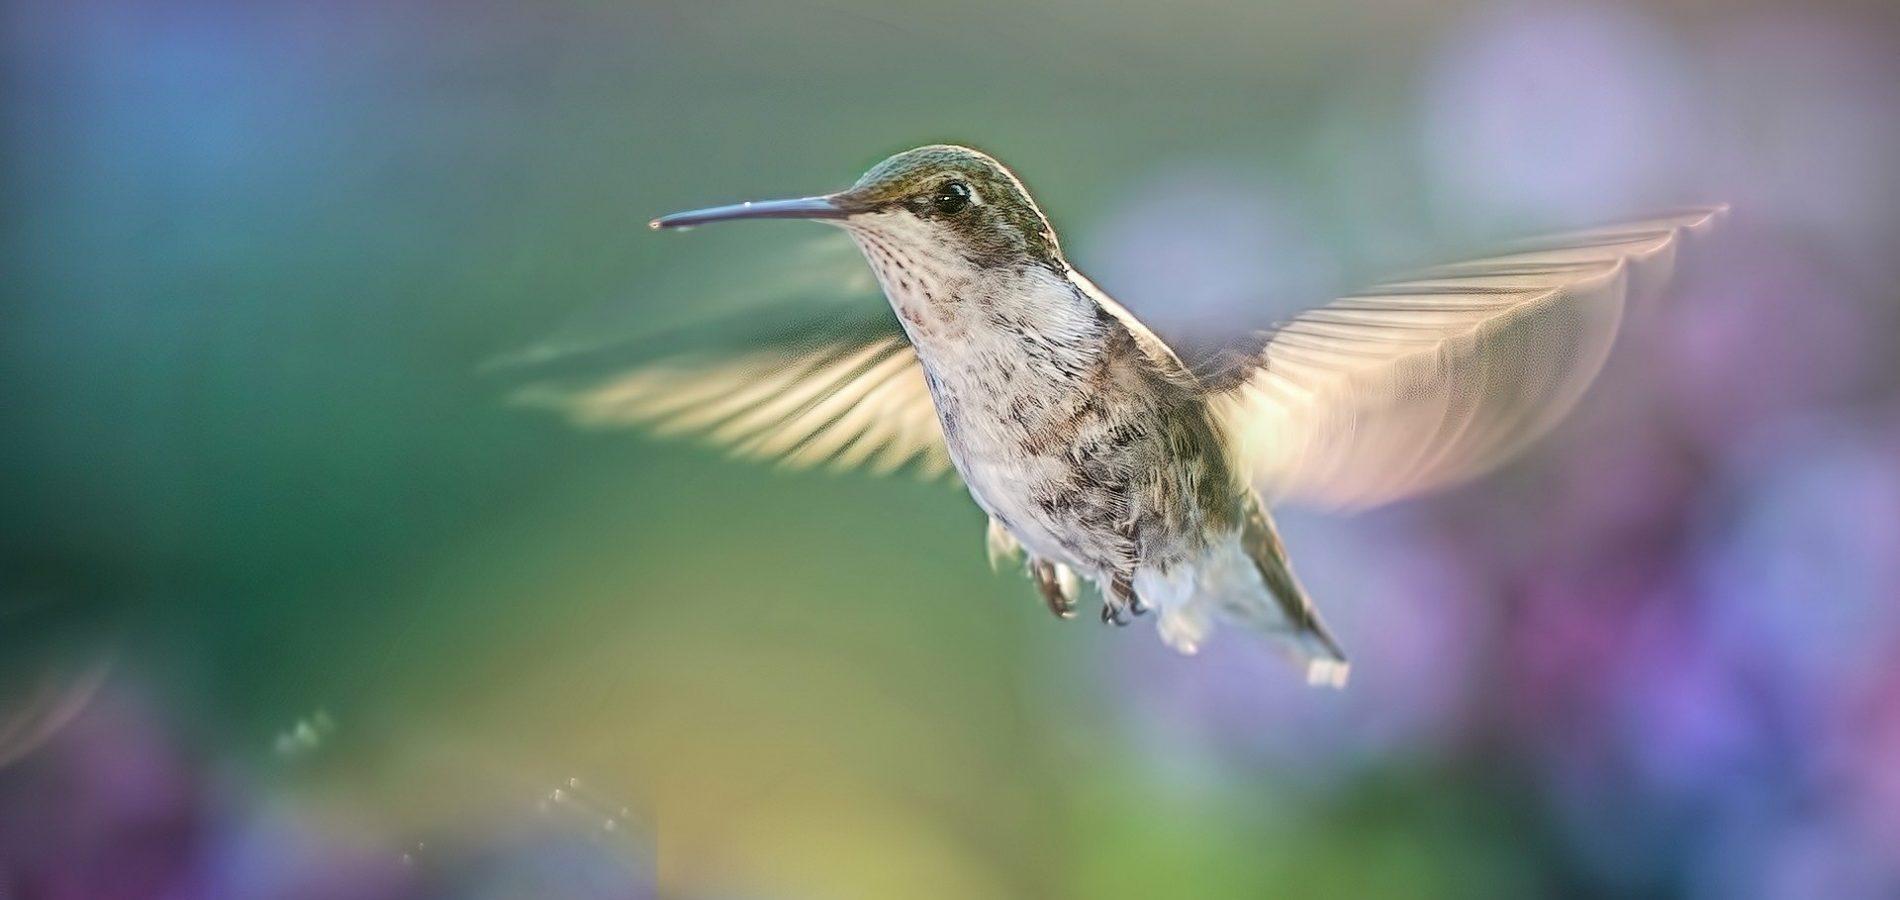 hummingbird-5477966_1920